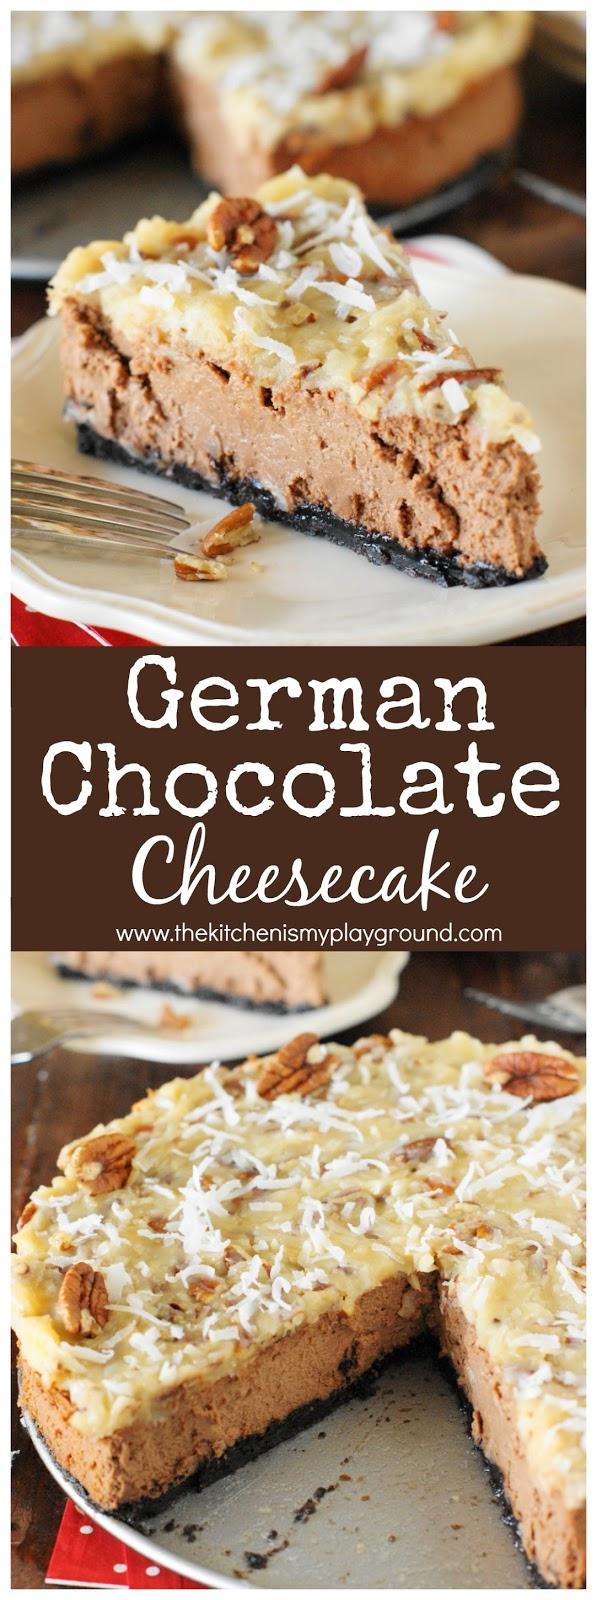 German Chocolate Cheesecake - The Kitchen is My Playground